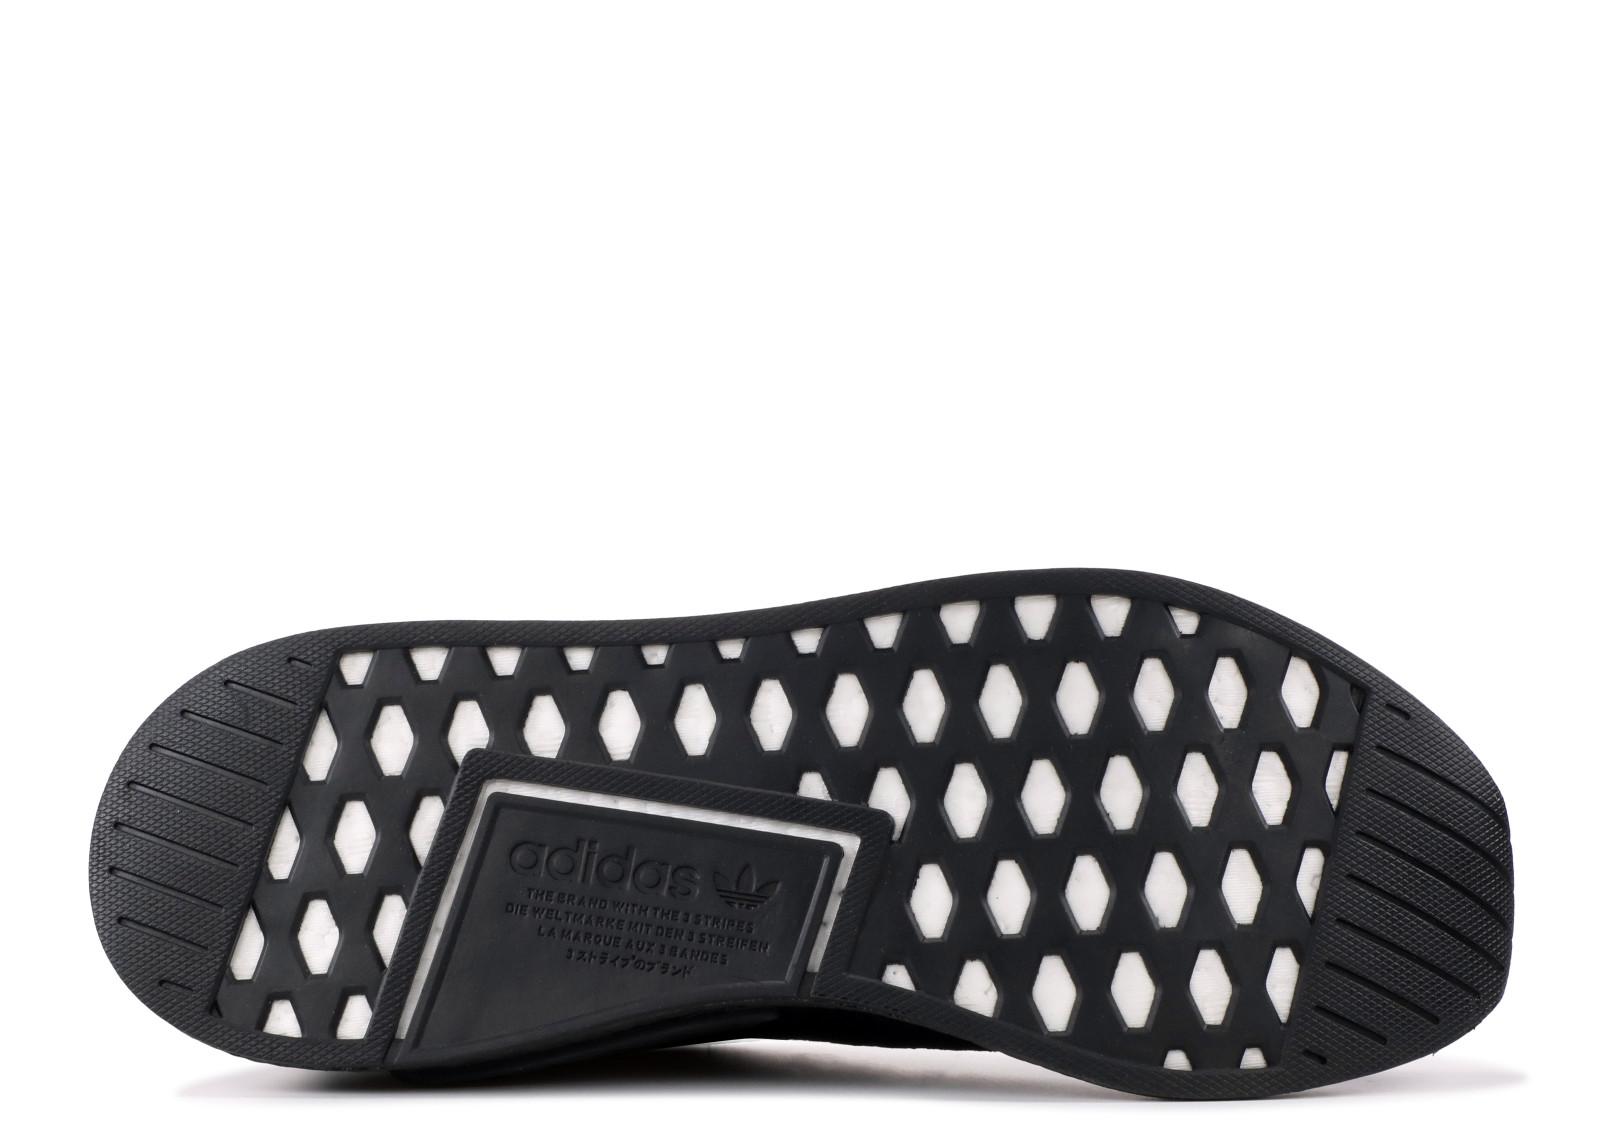 858c5eebe7e4d adidas NMD CS2 Primeknit Triple Black - 4